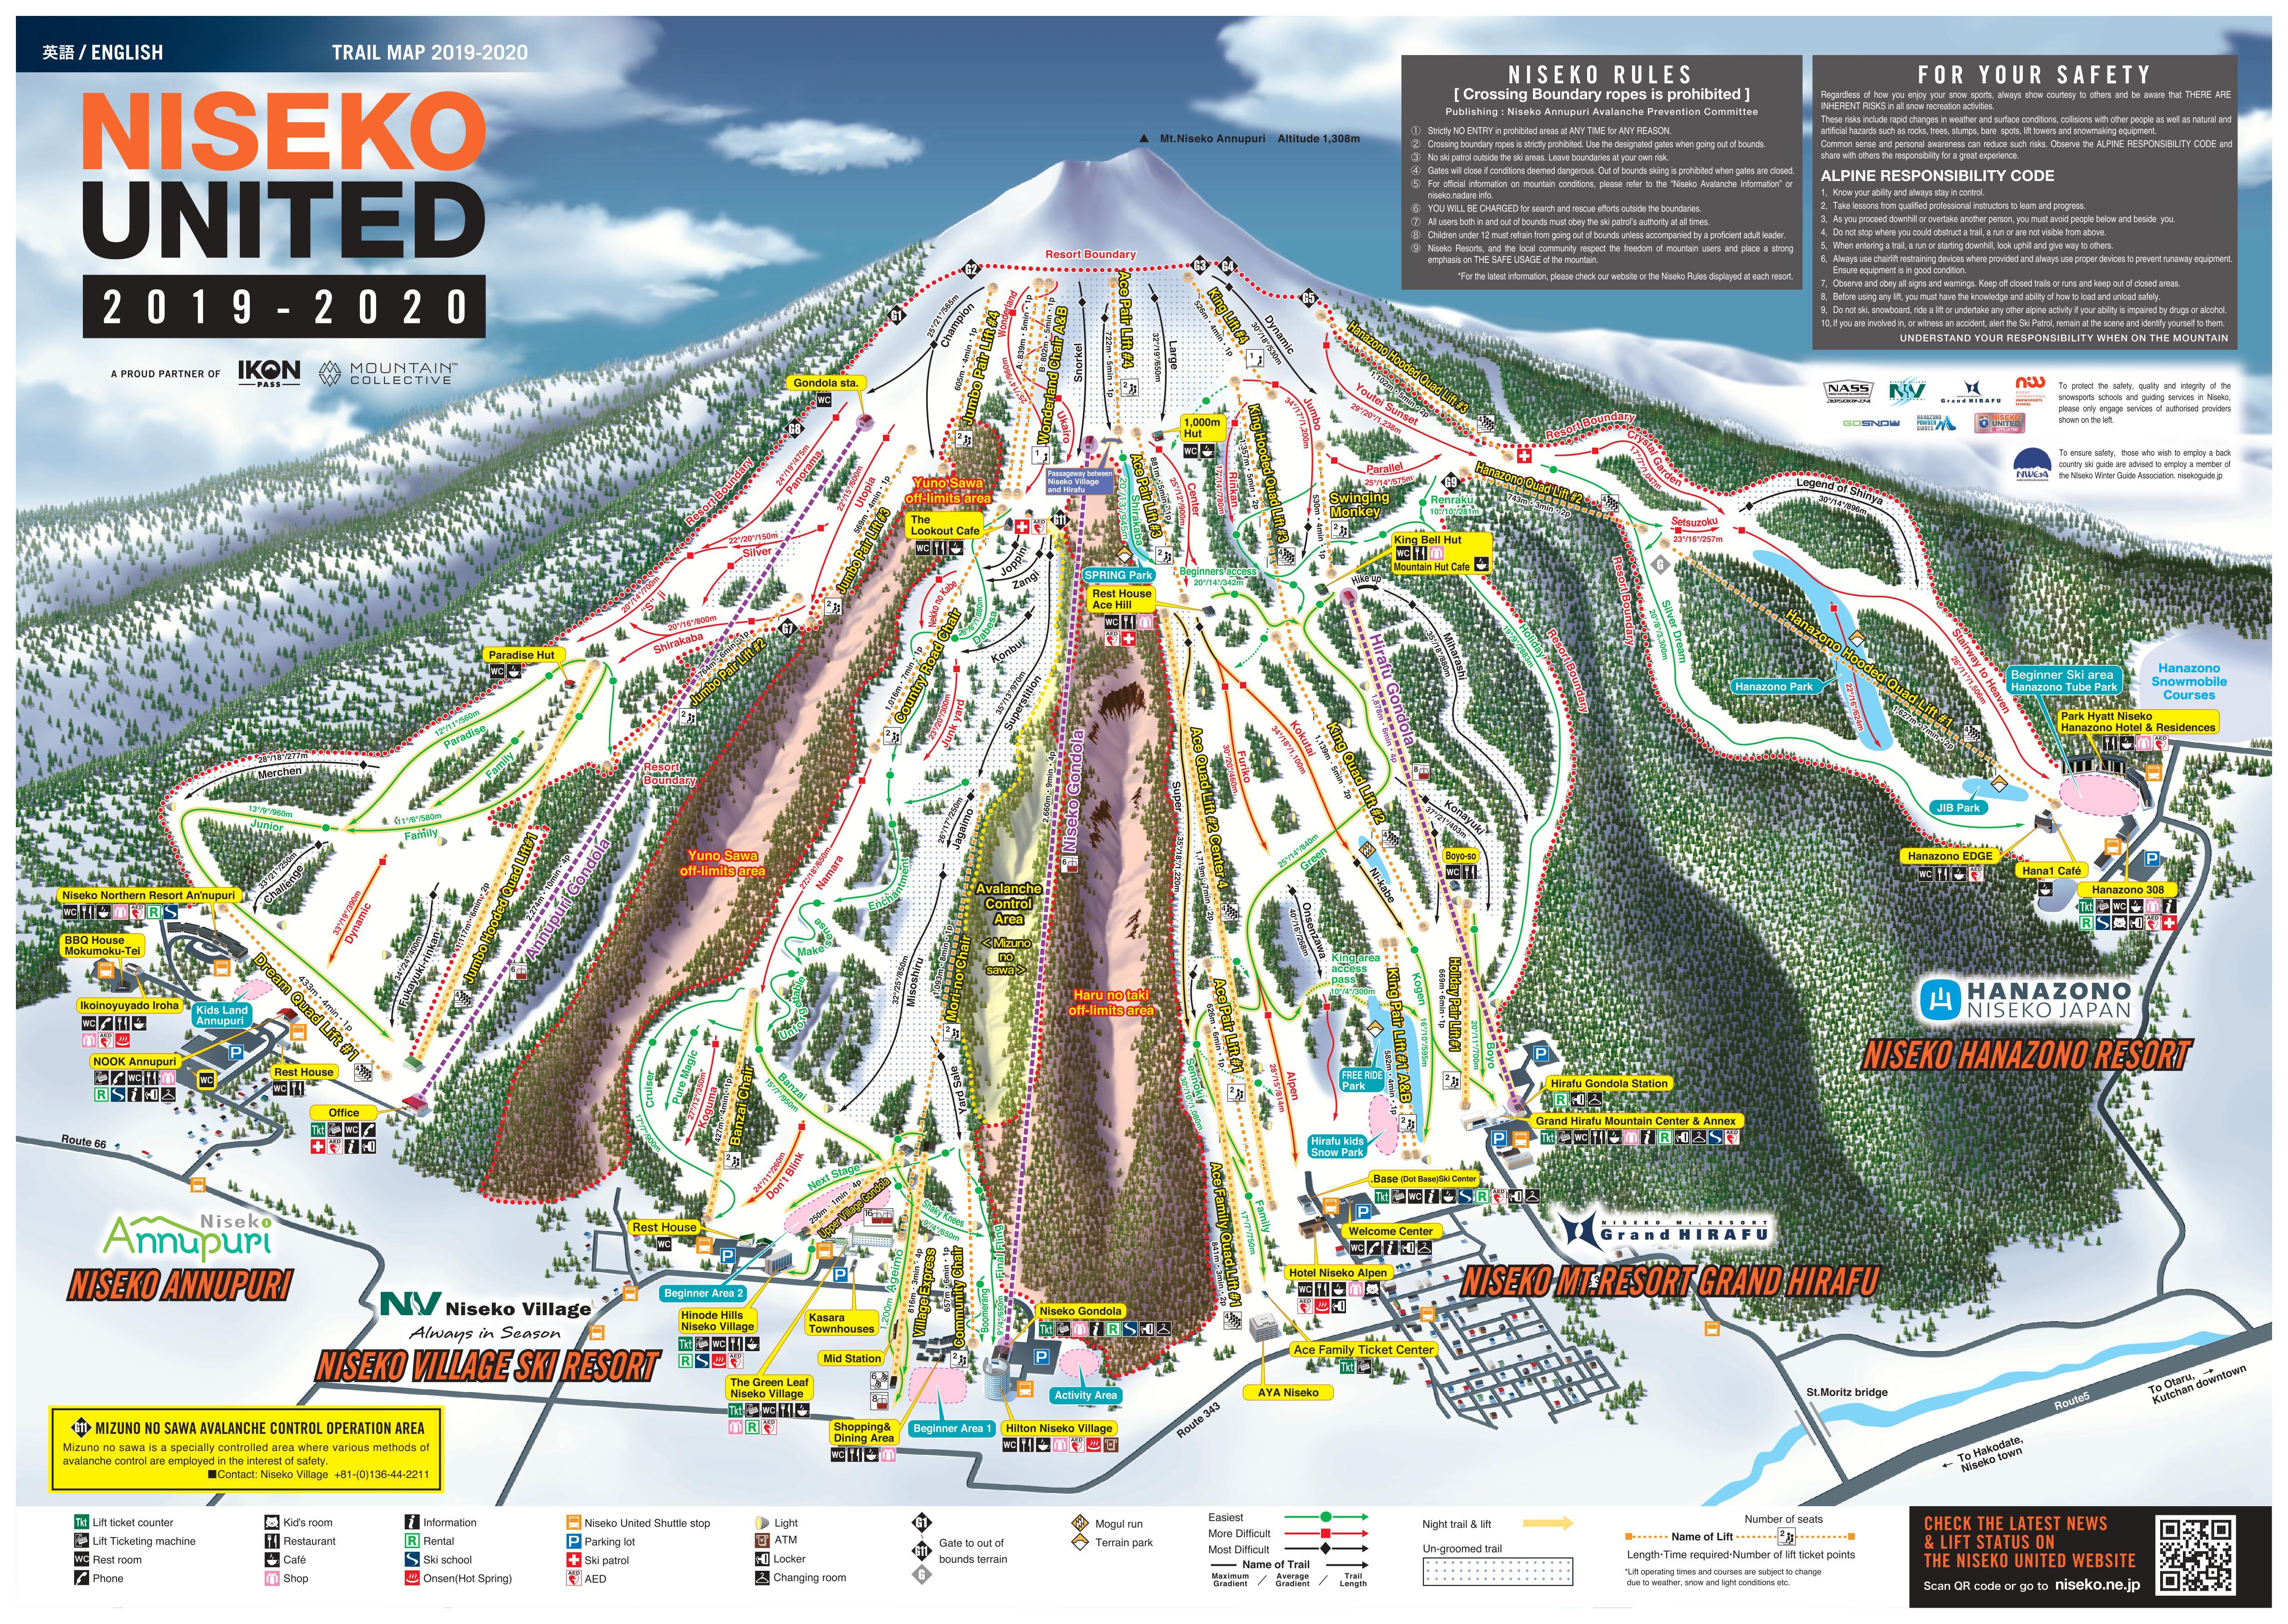 Pistenplan von Niseko United (Hanazono – Grand Hirafu – Niseko Village – Annupuri)